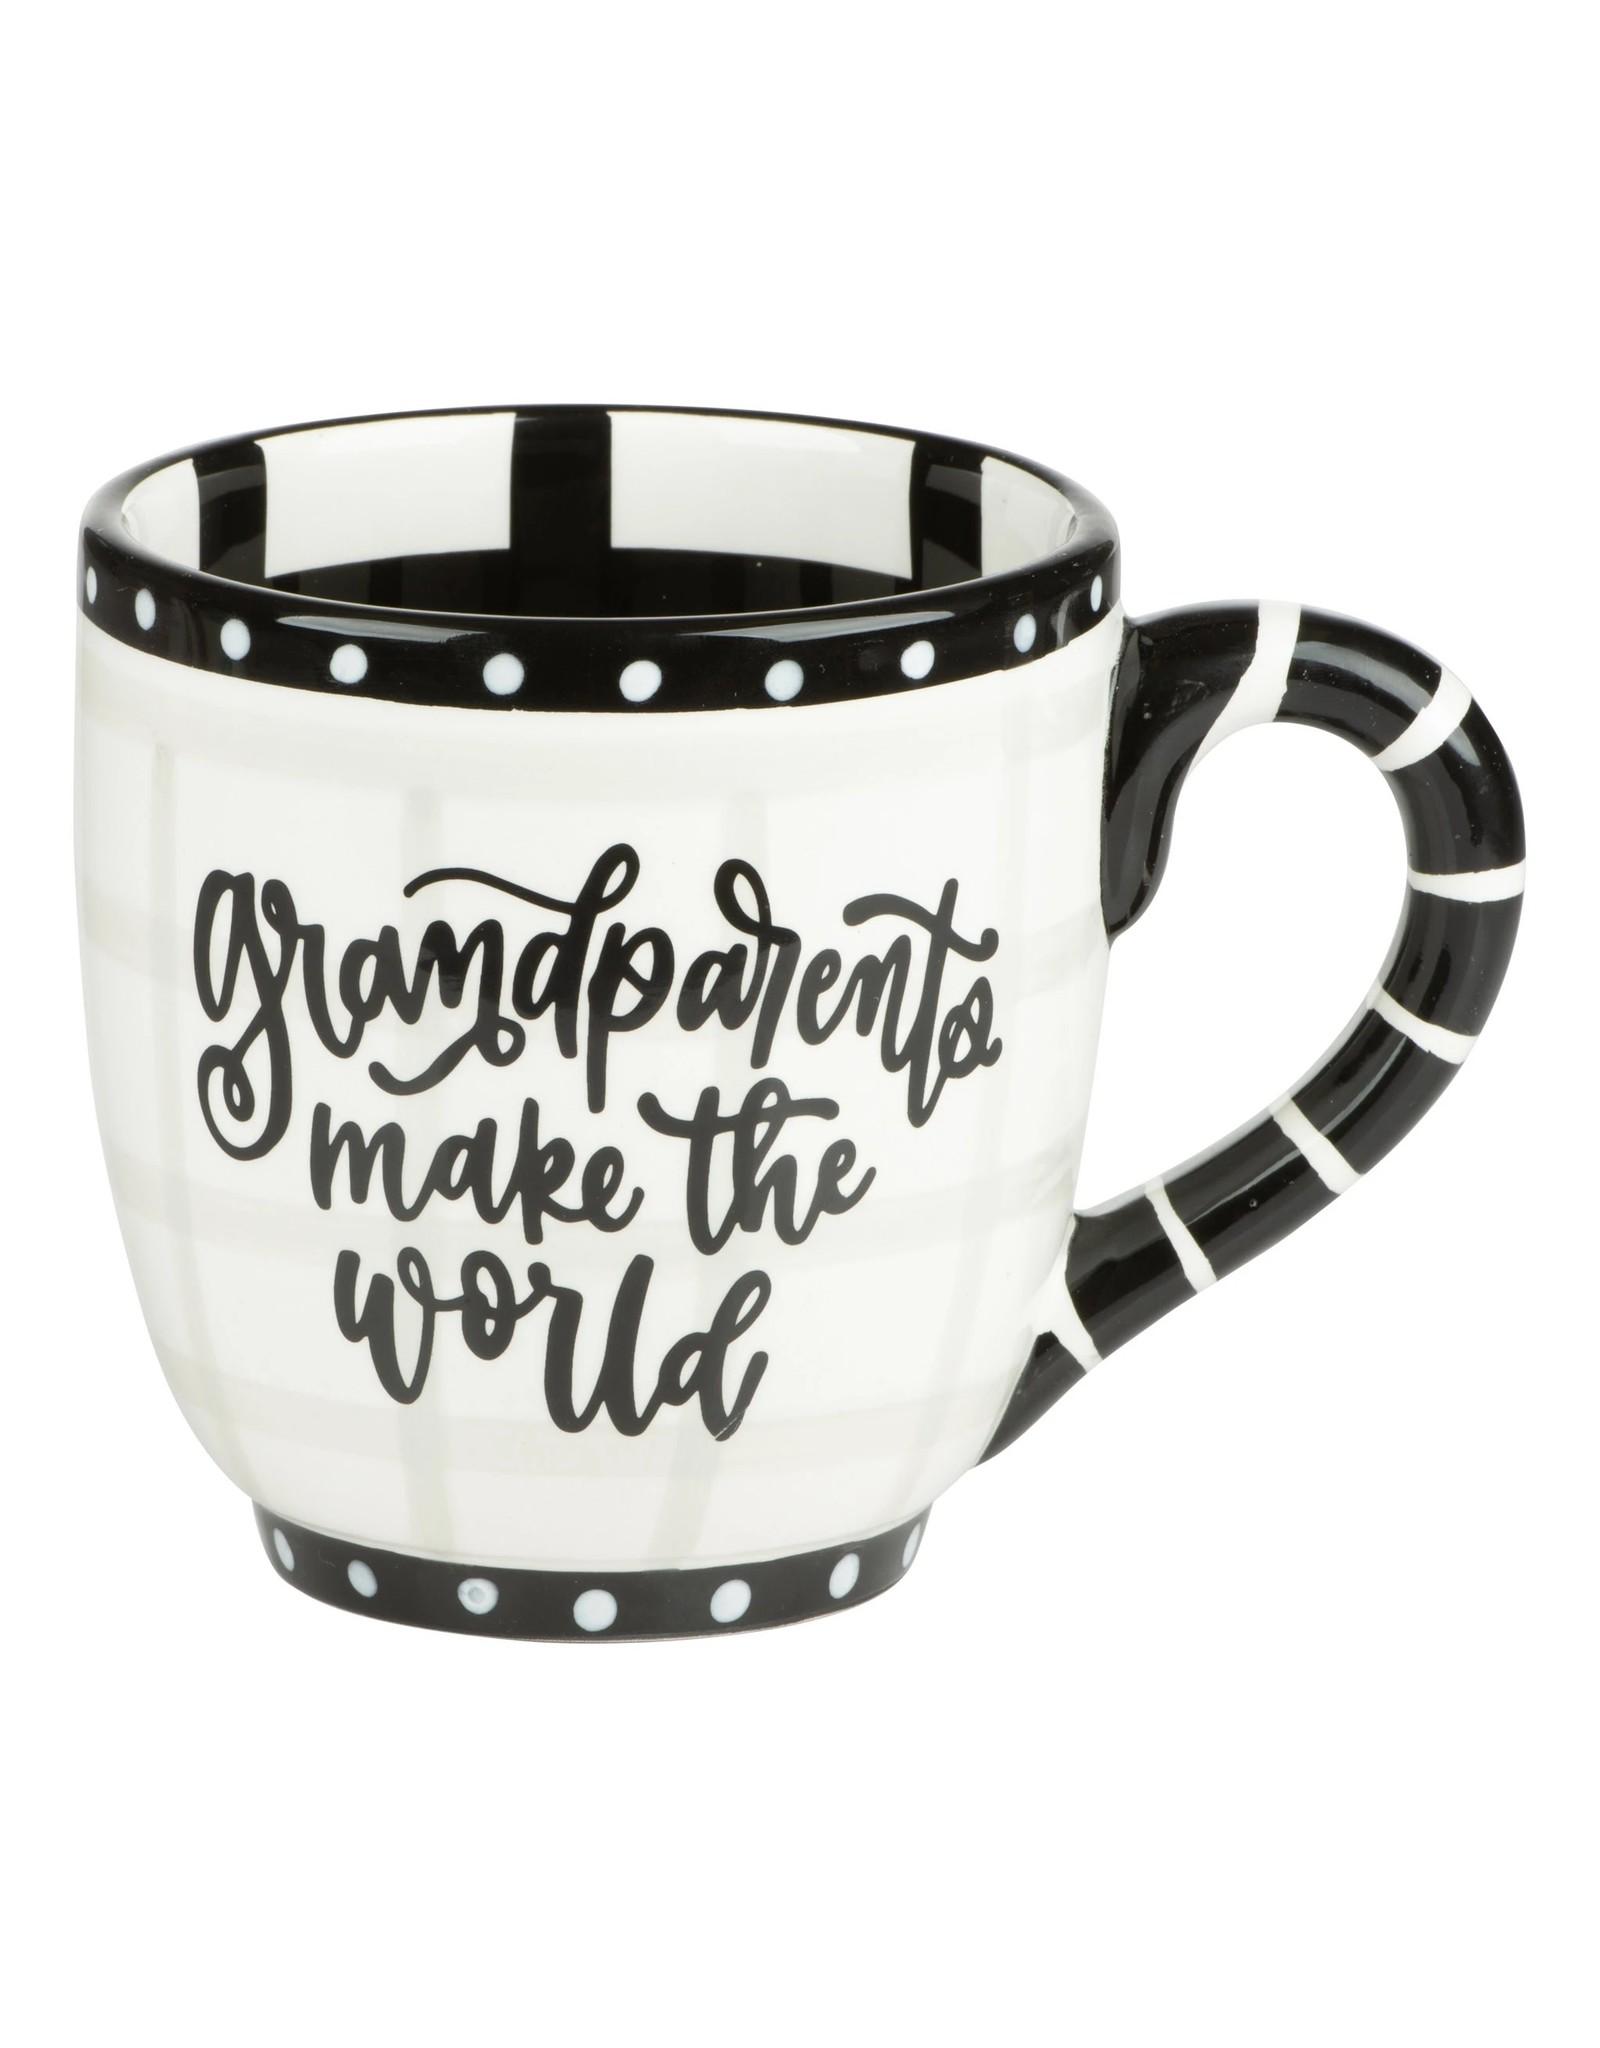 Glory Haus Grandparents Make the World Better